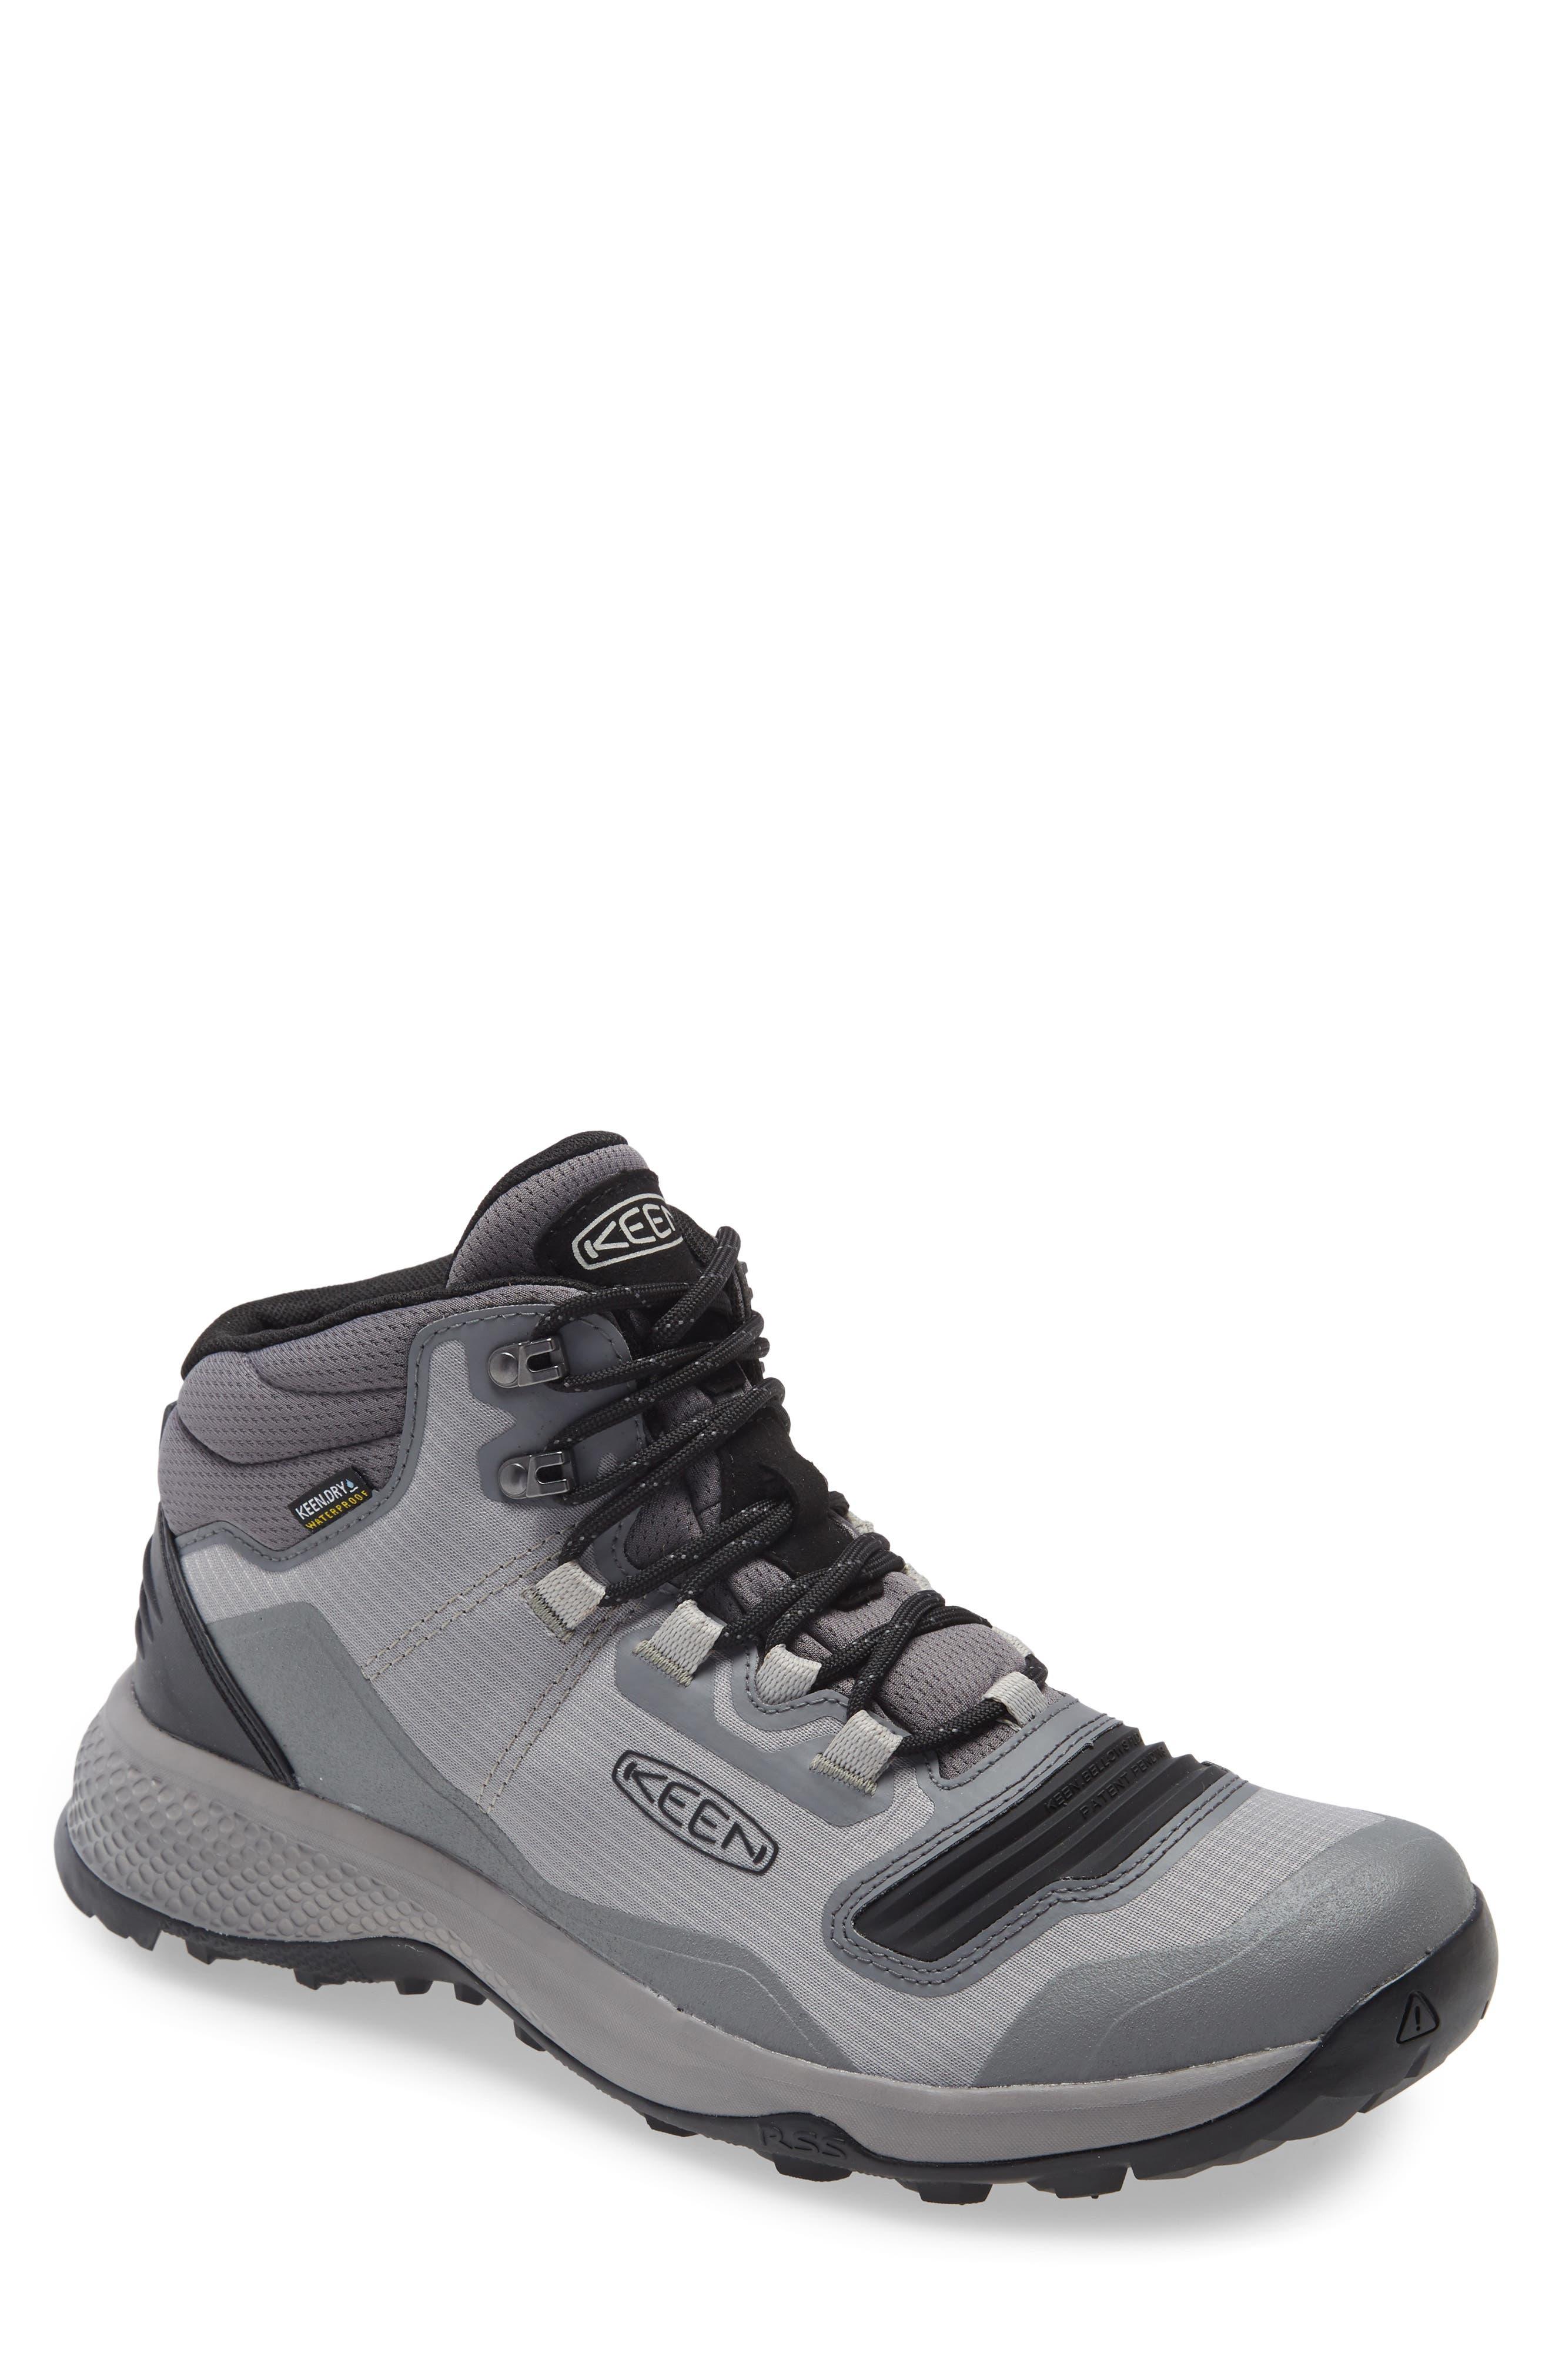 Tempo Flex Waterproof Mid Hiking Boot